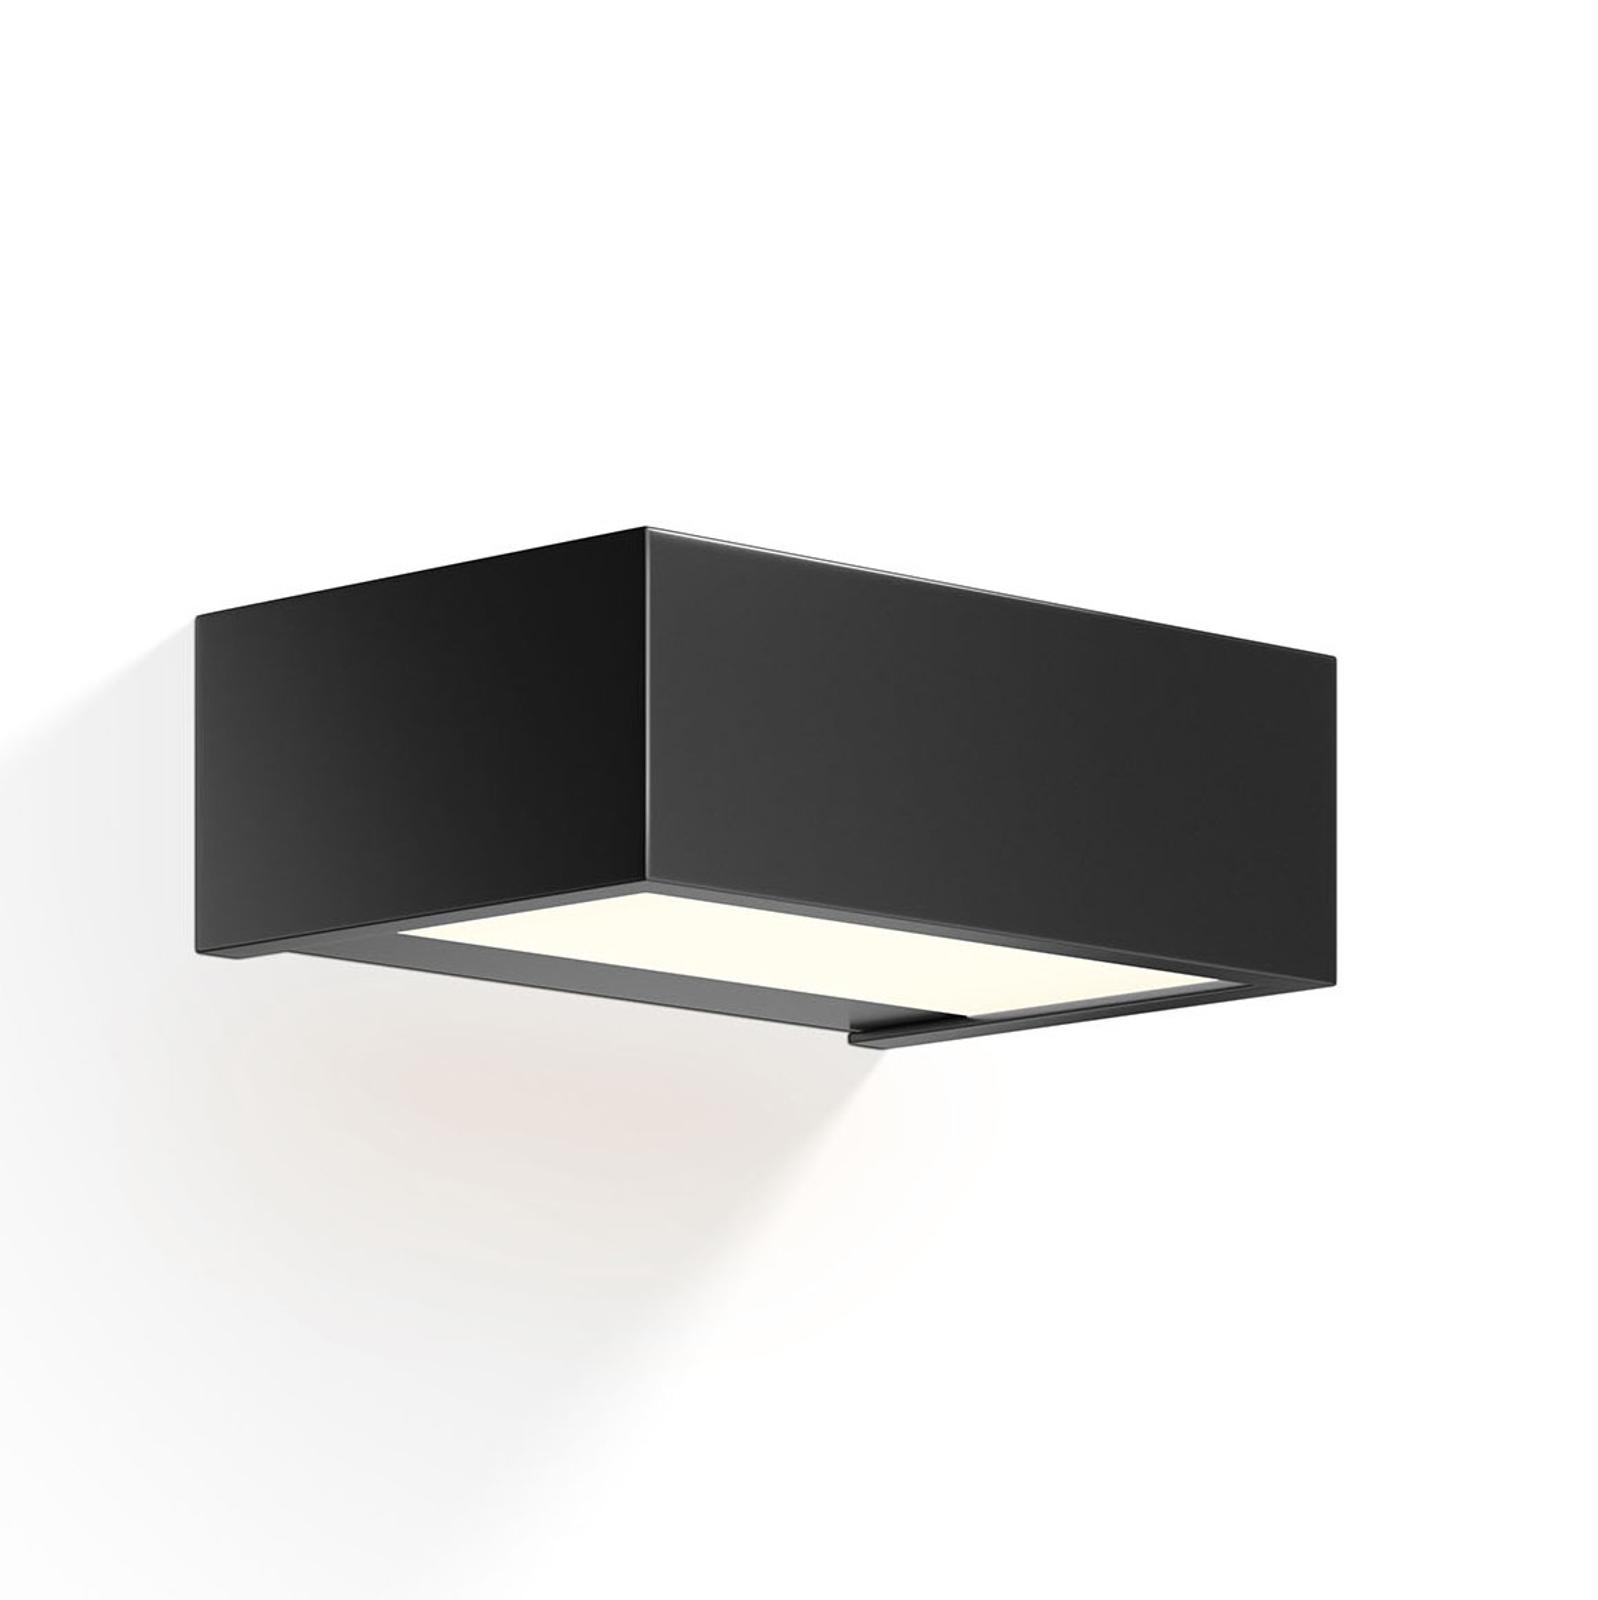 Decor Walther Box LED-lampe sort 2.700 K 15 cm